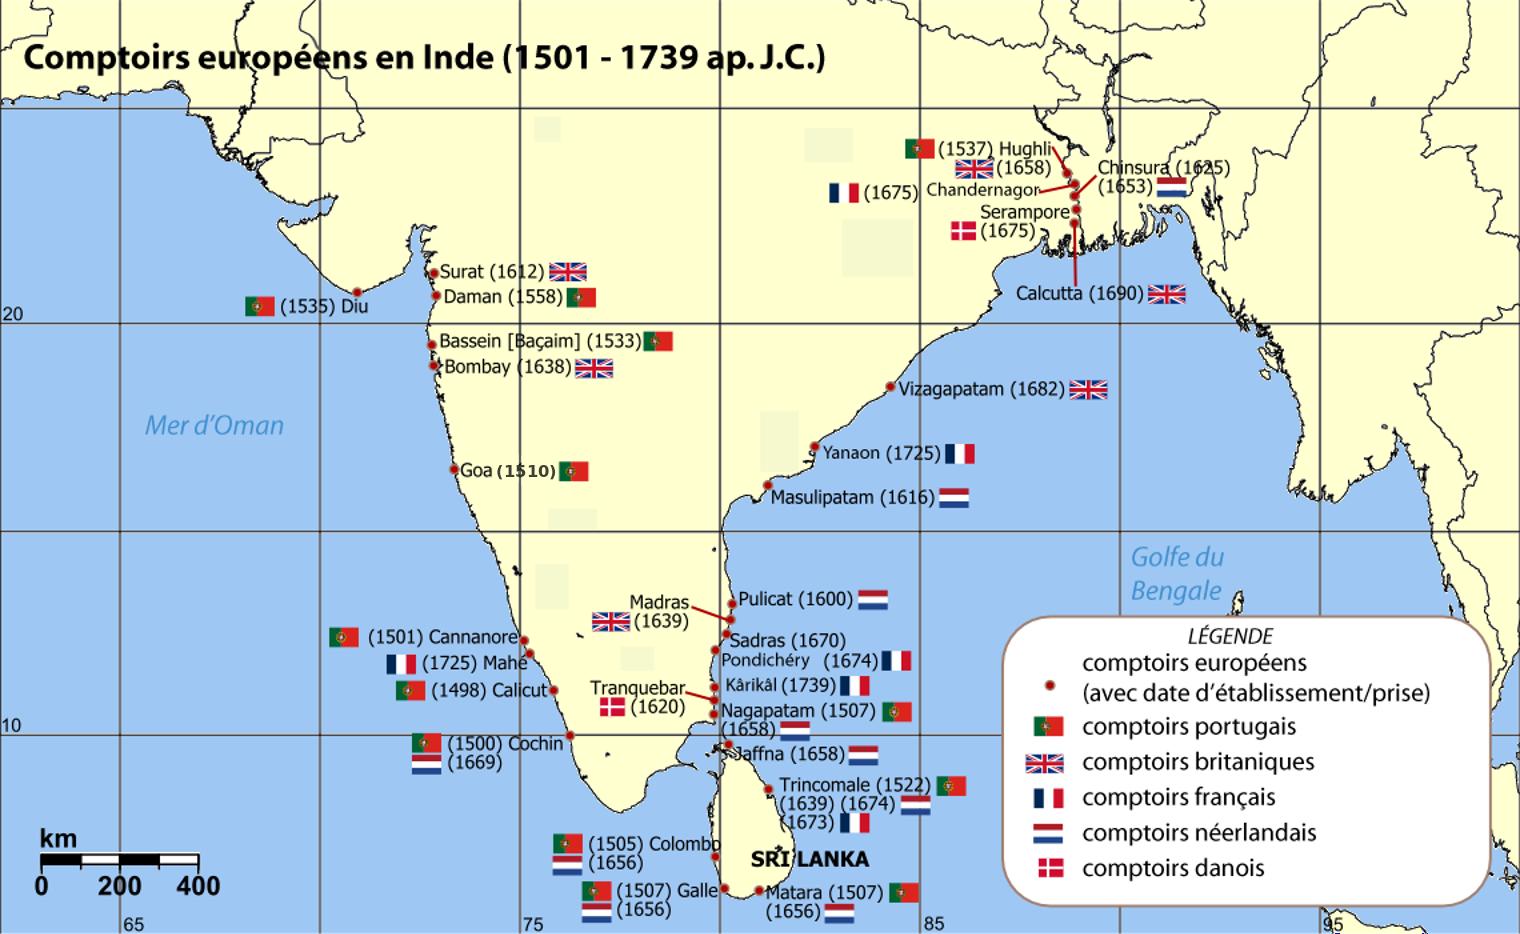 Pondichéry Des Comptoirs Français à Linde Daujourdhui 1664